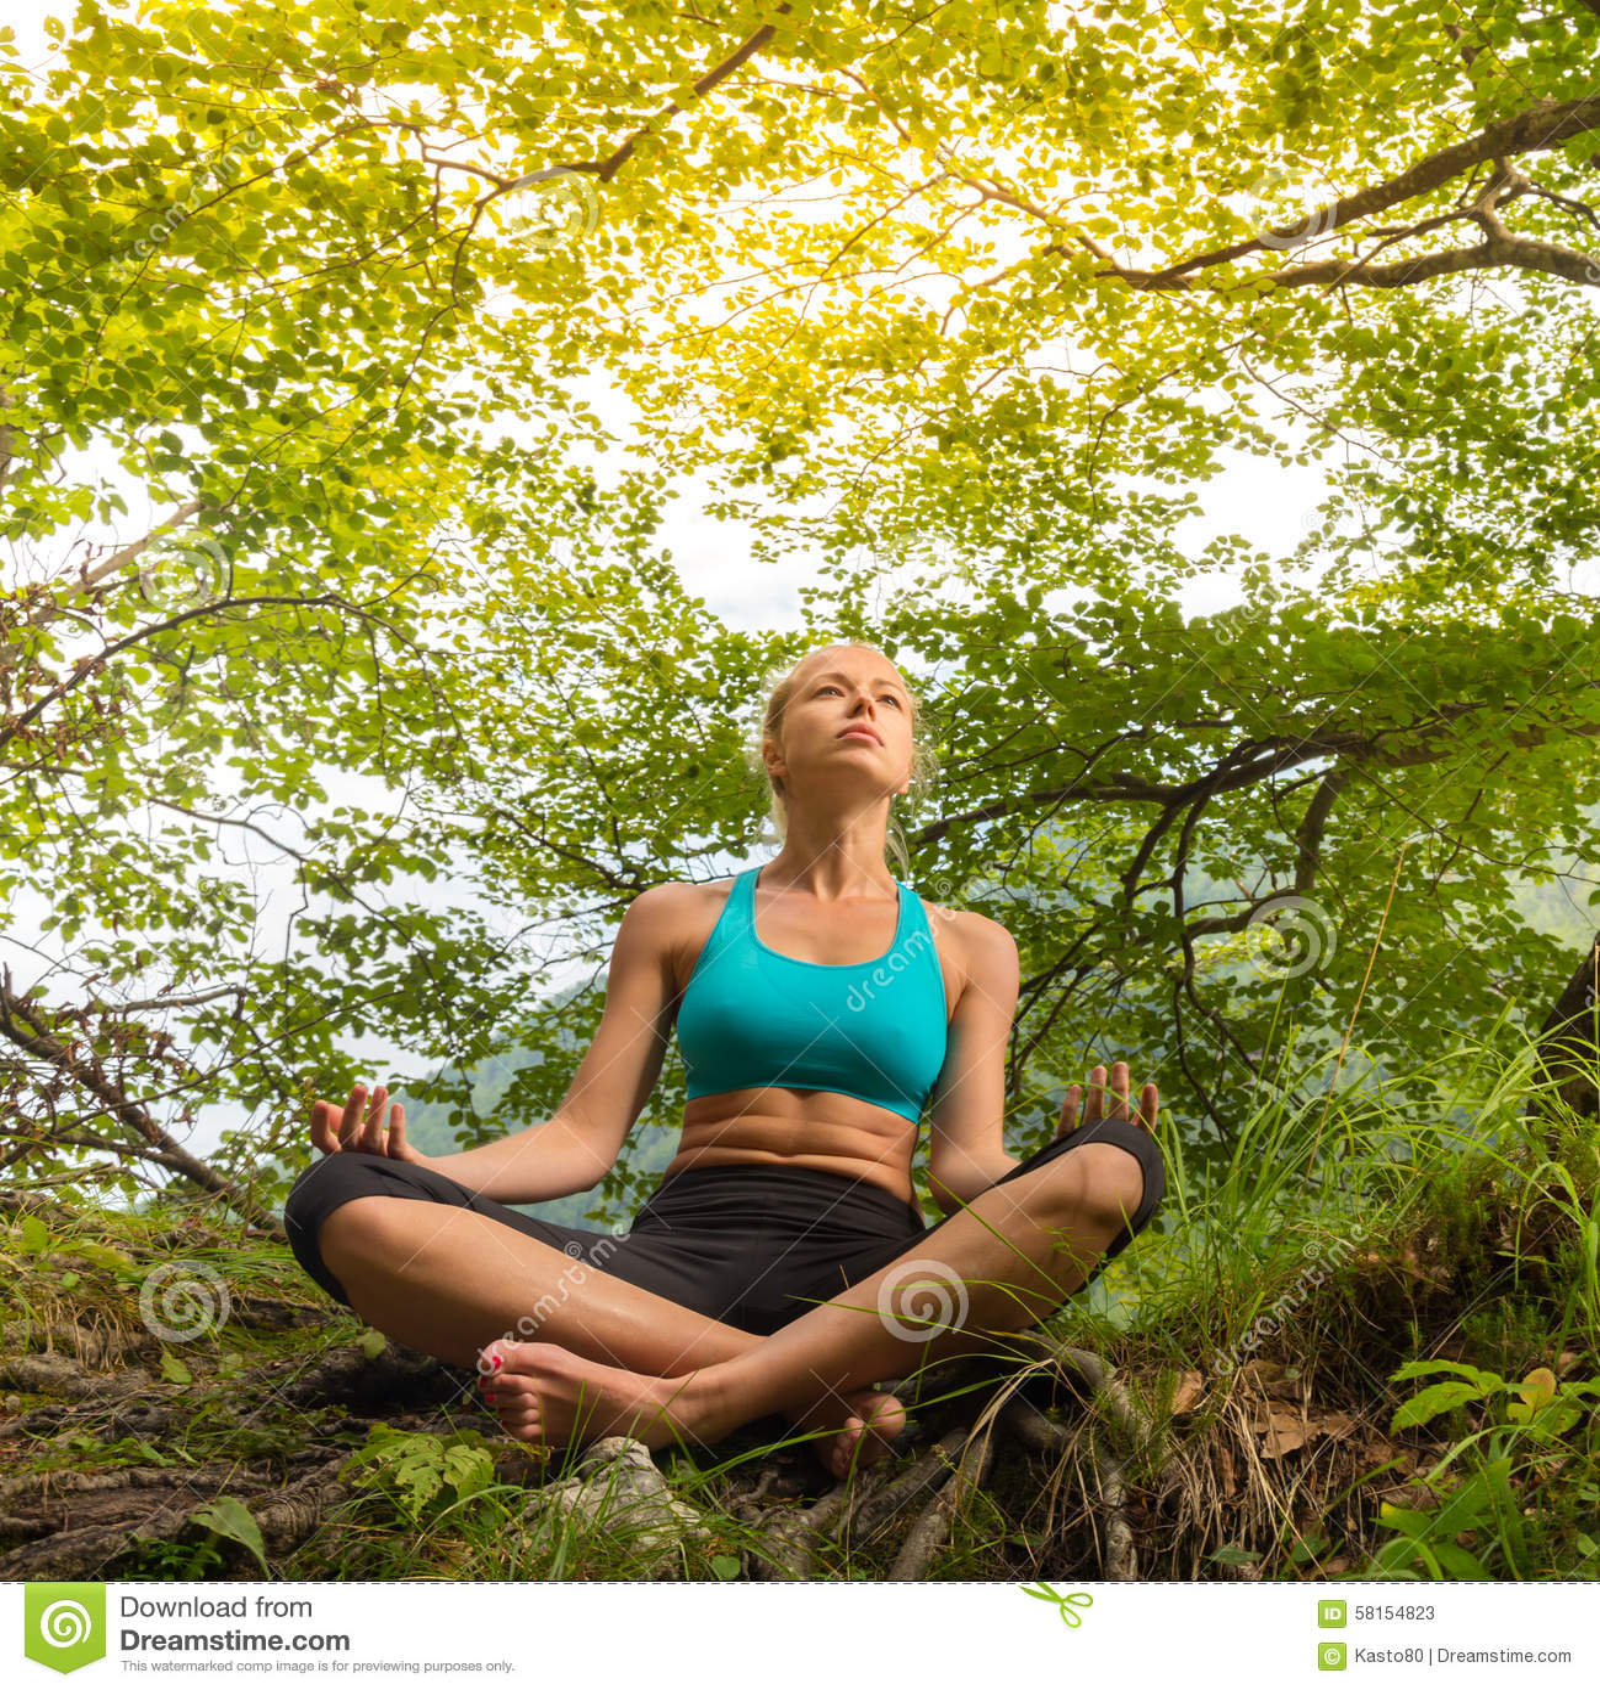 Woman Relaxing In Beautiful Nature. Stock Photo